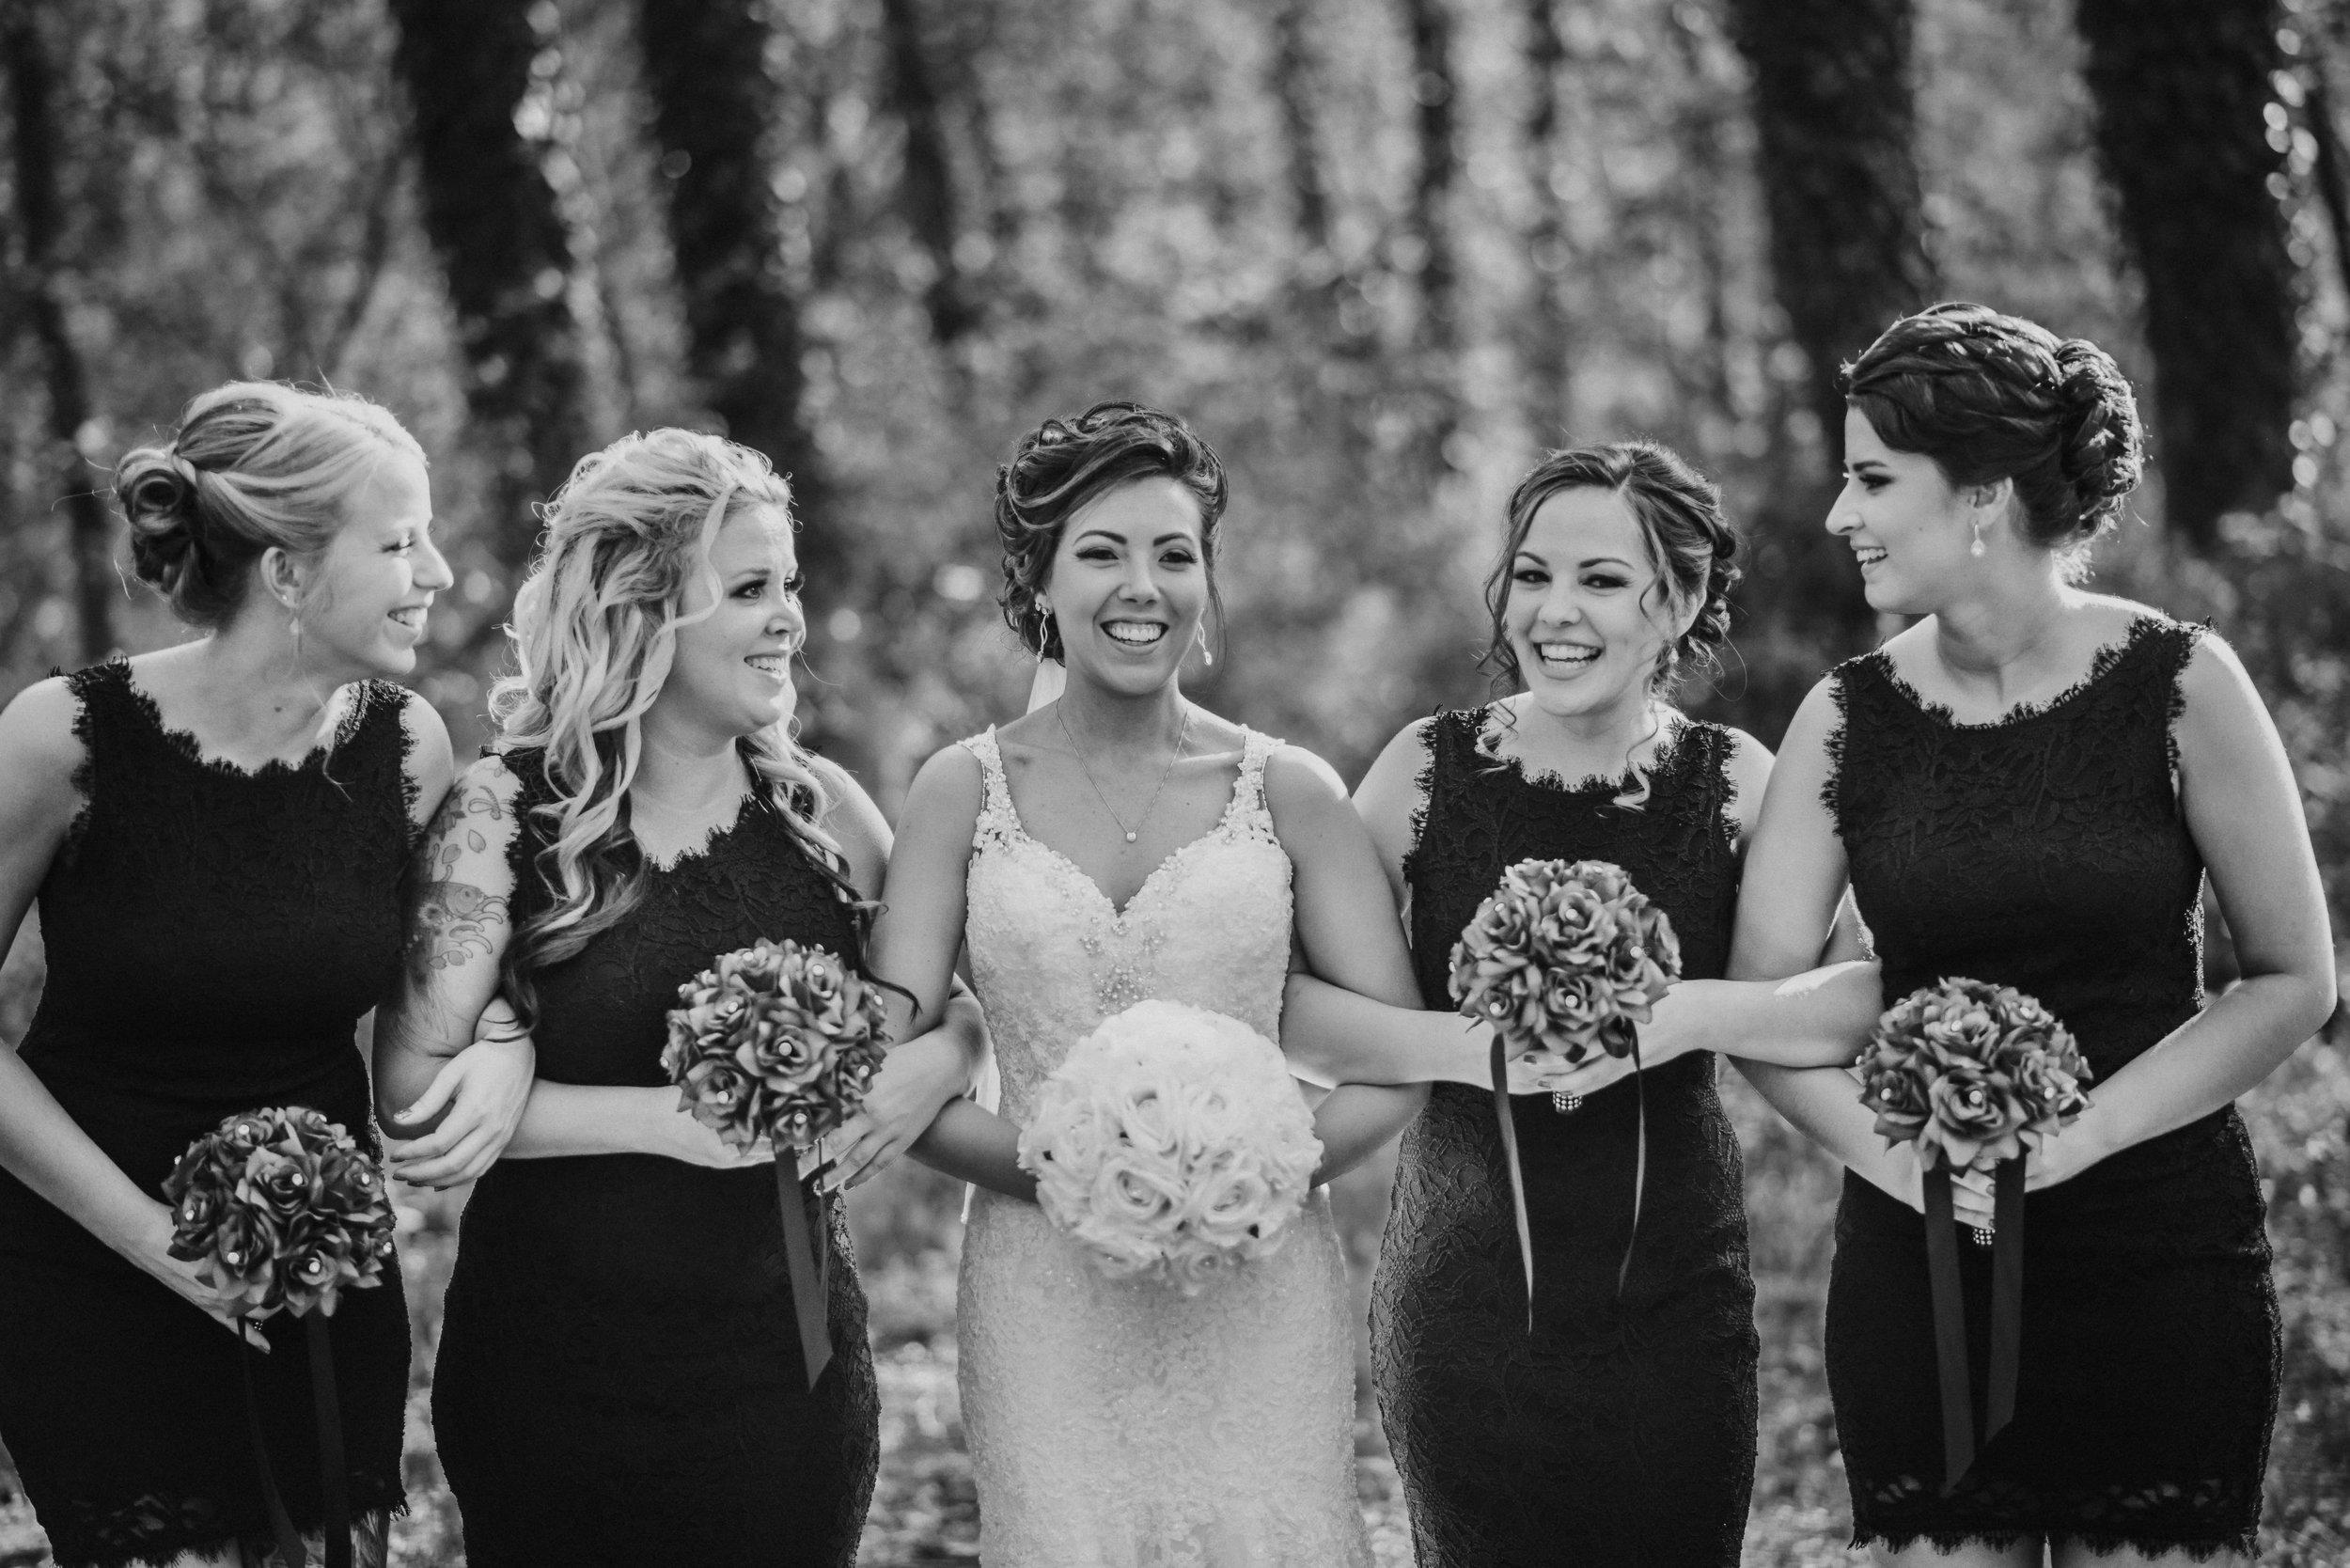 Christina-and-Gene-Wedding-Marla-Rain-Photography-232.jpg